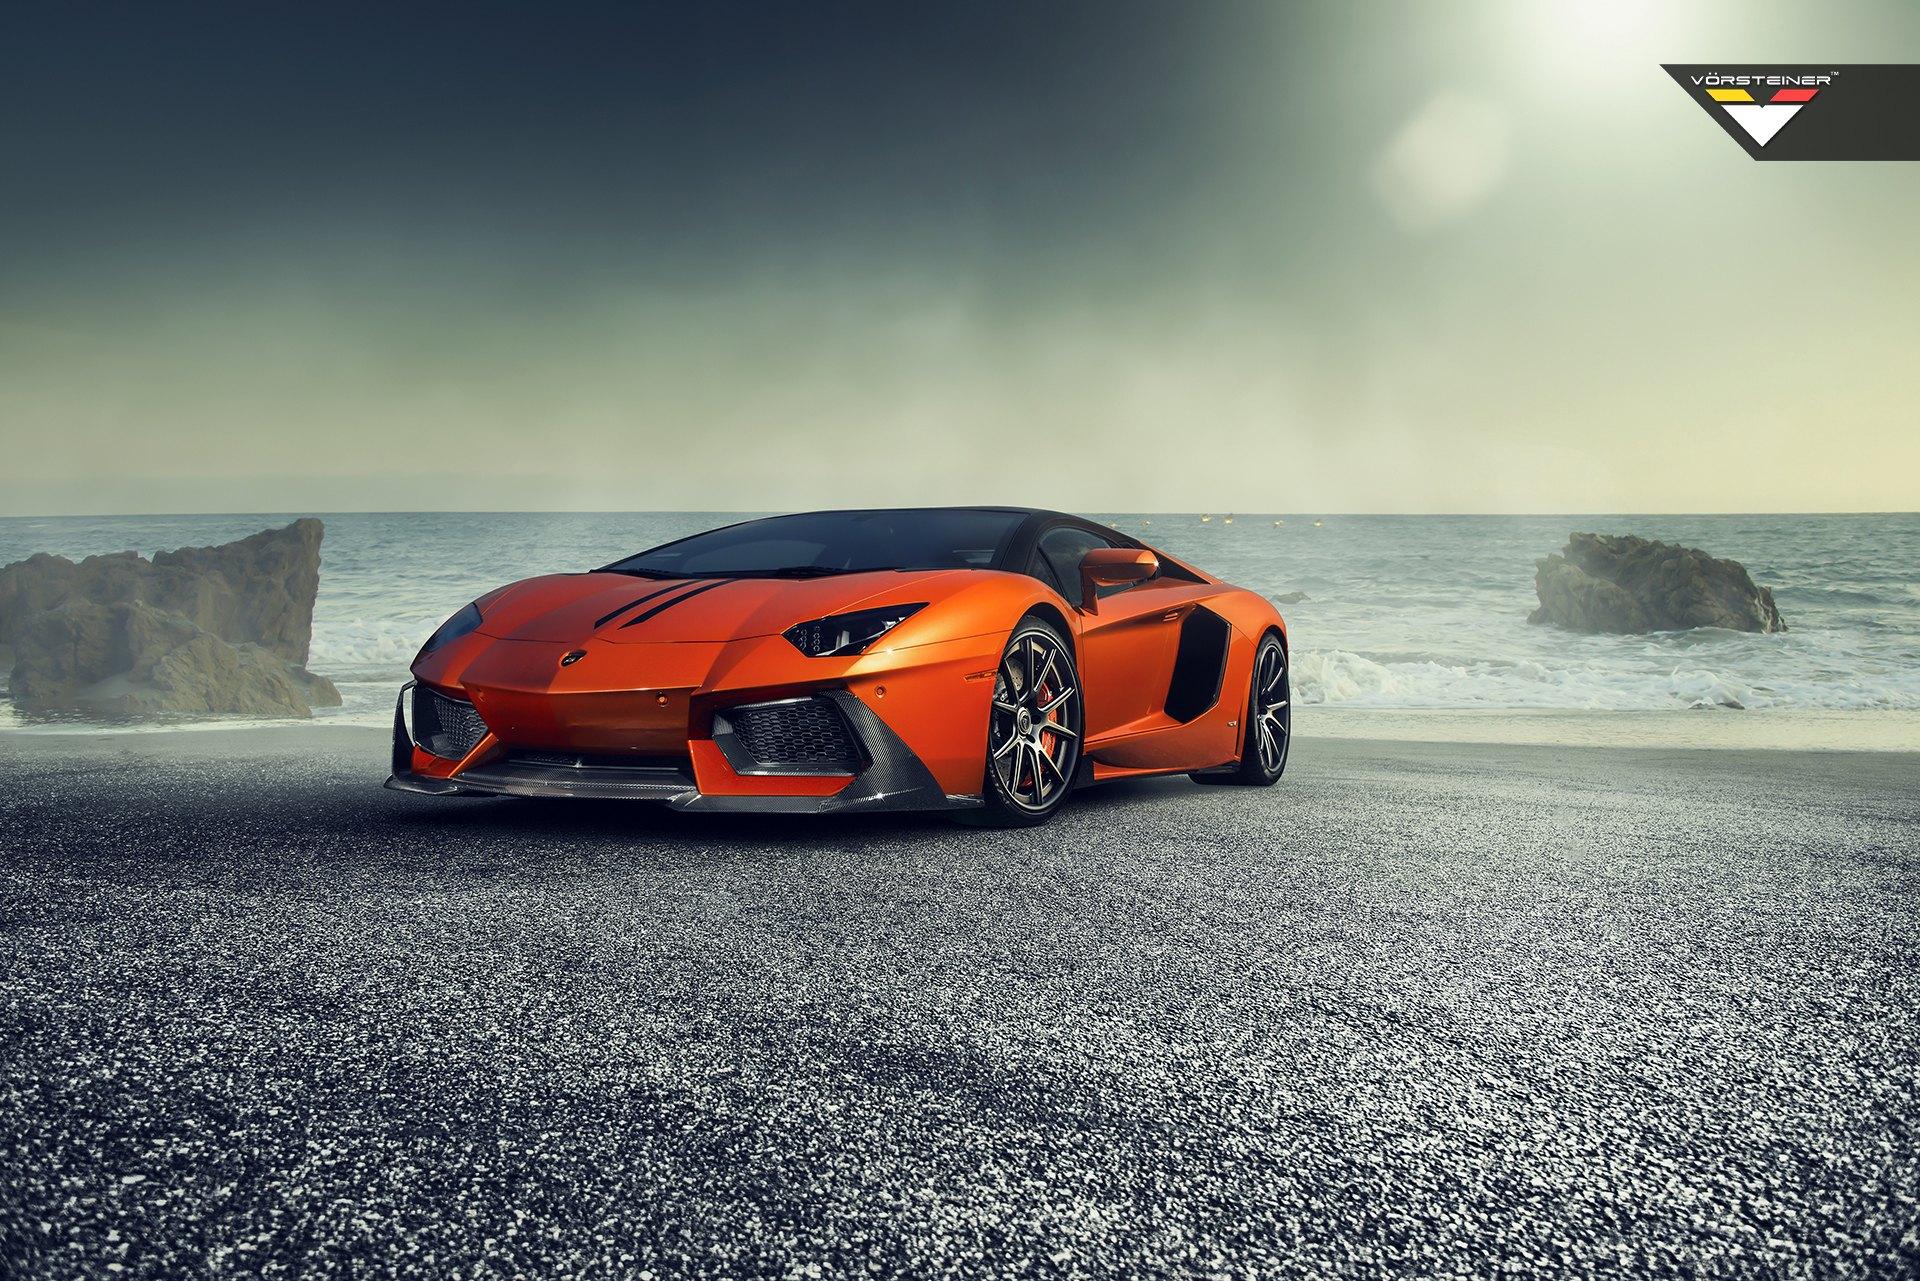 Custom Lamborghini Aventador Images Mods Photos